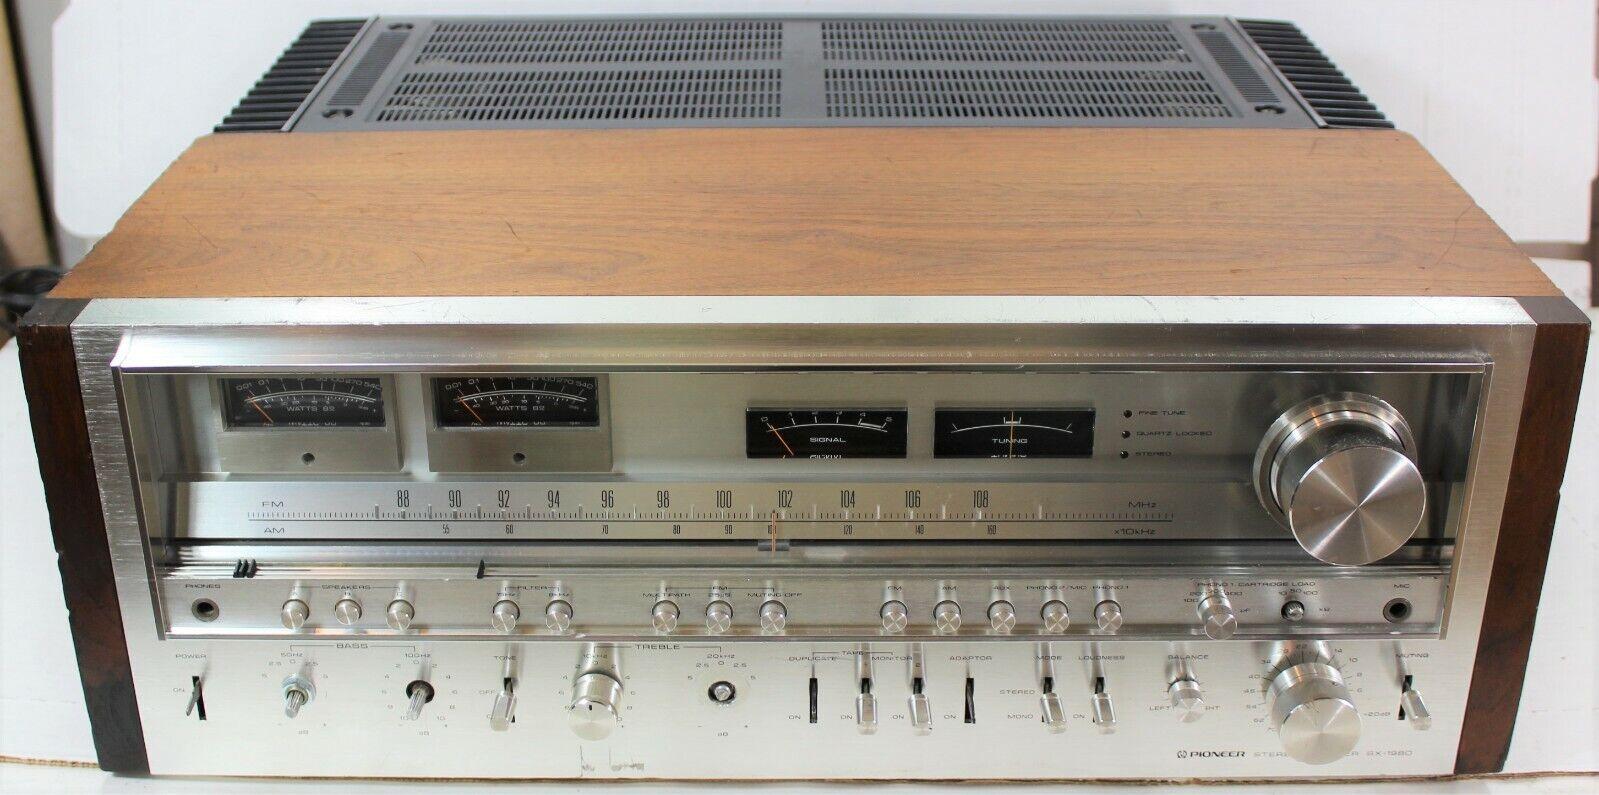 Pioneer SX 1980 On eBay.